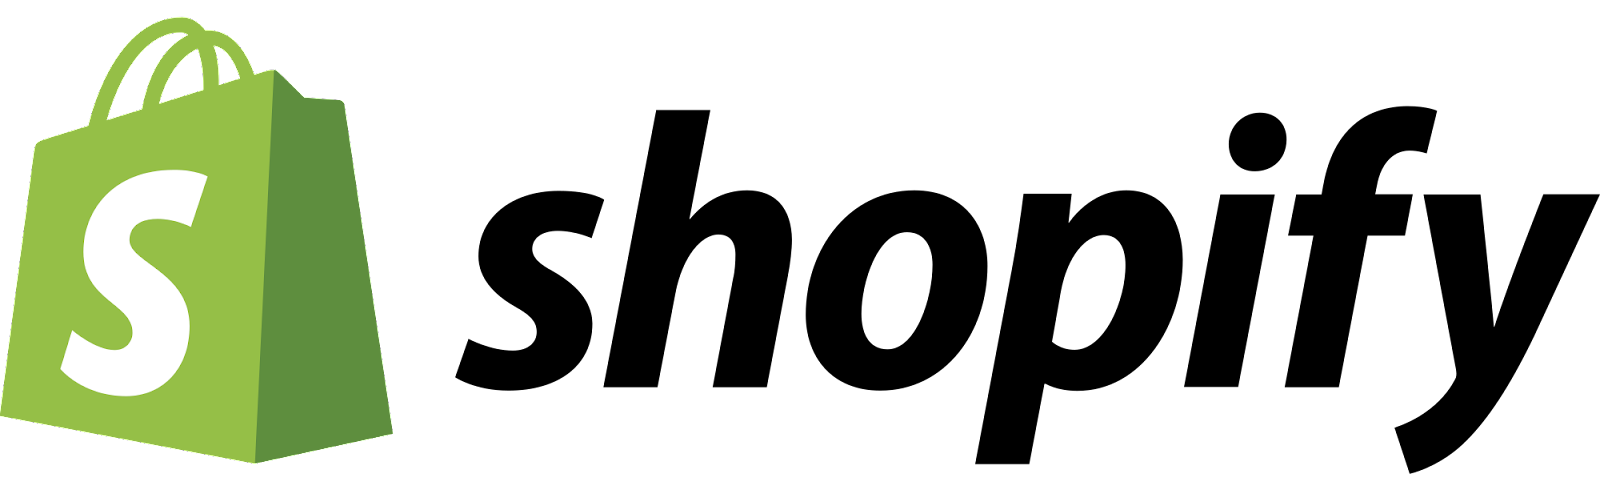 https://upload.wikimedia.org/wikipedia/commons/thumb/0/0e/Shopify_logo_2018.svg/2000px-Shopify_logo_2018.svg.png